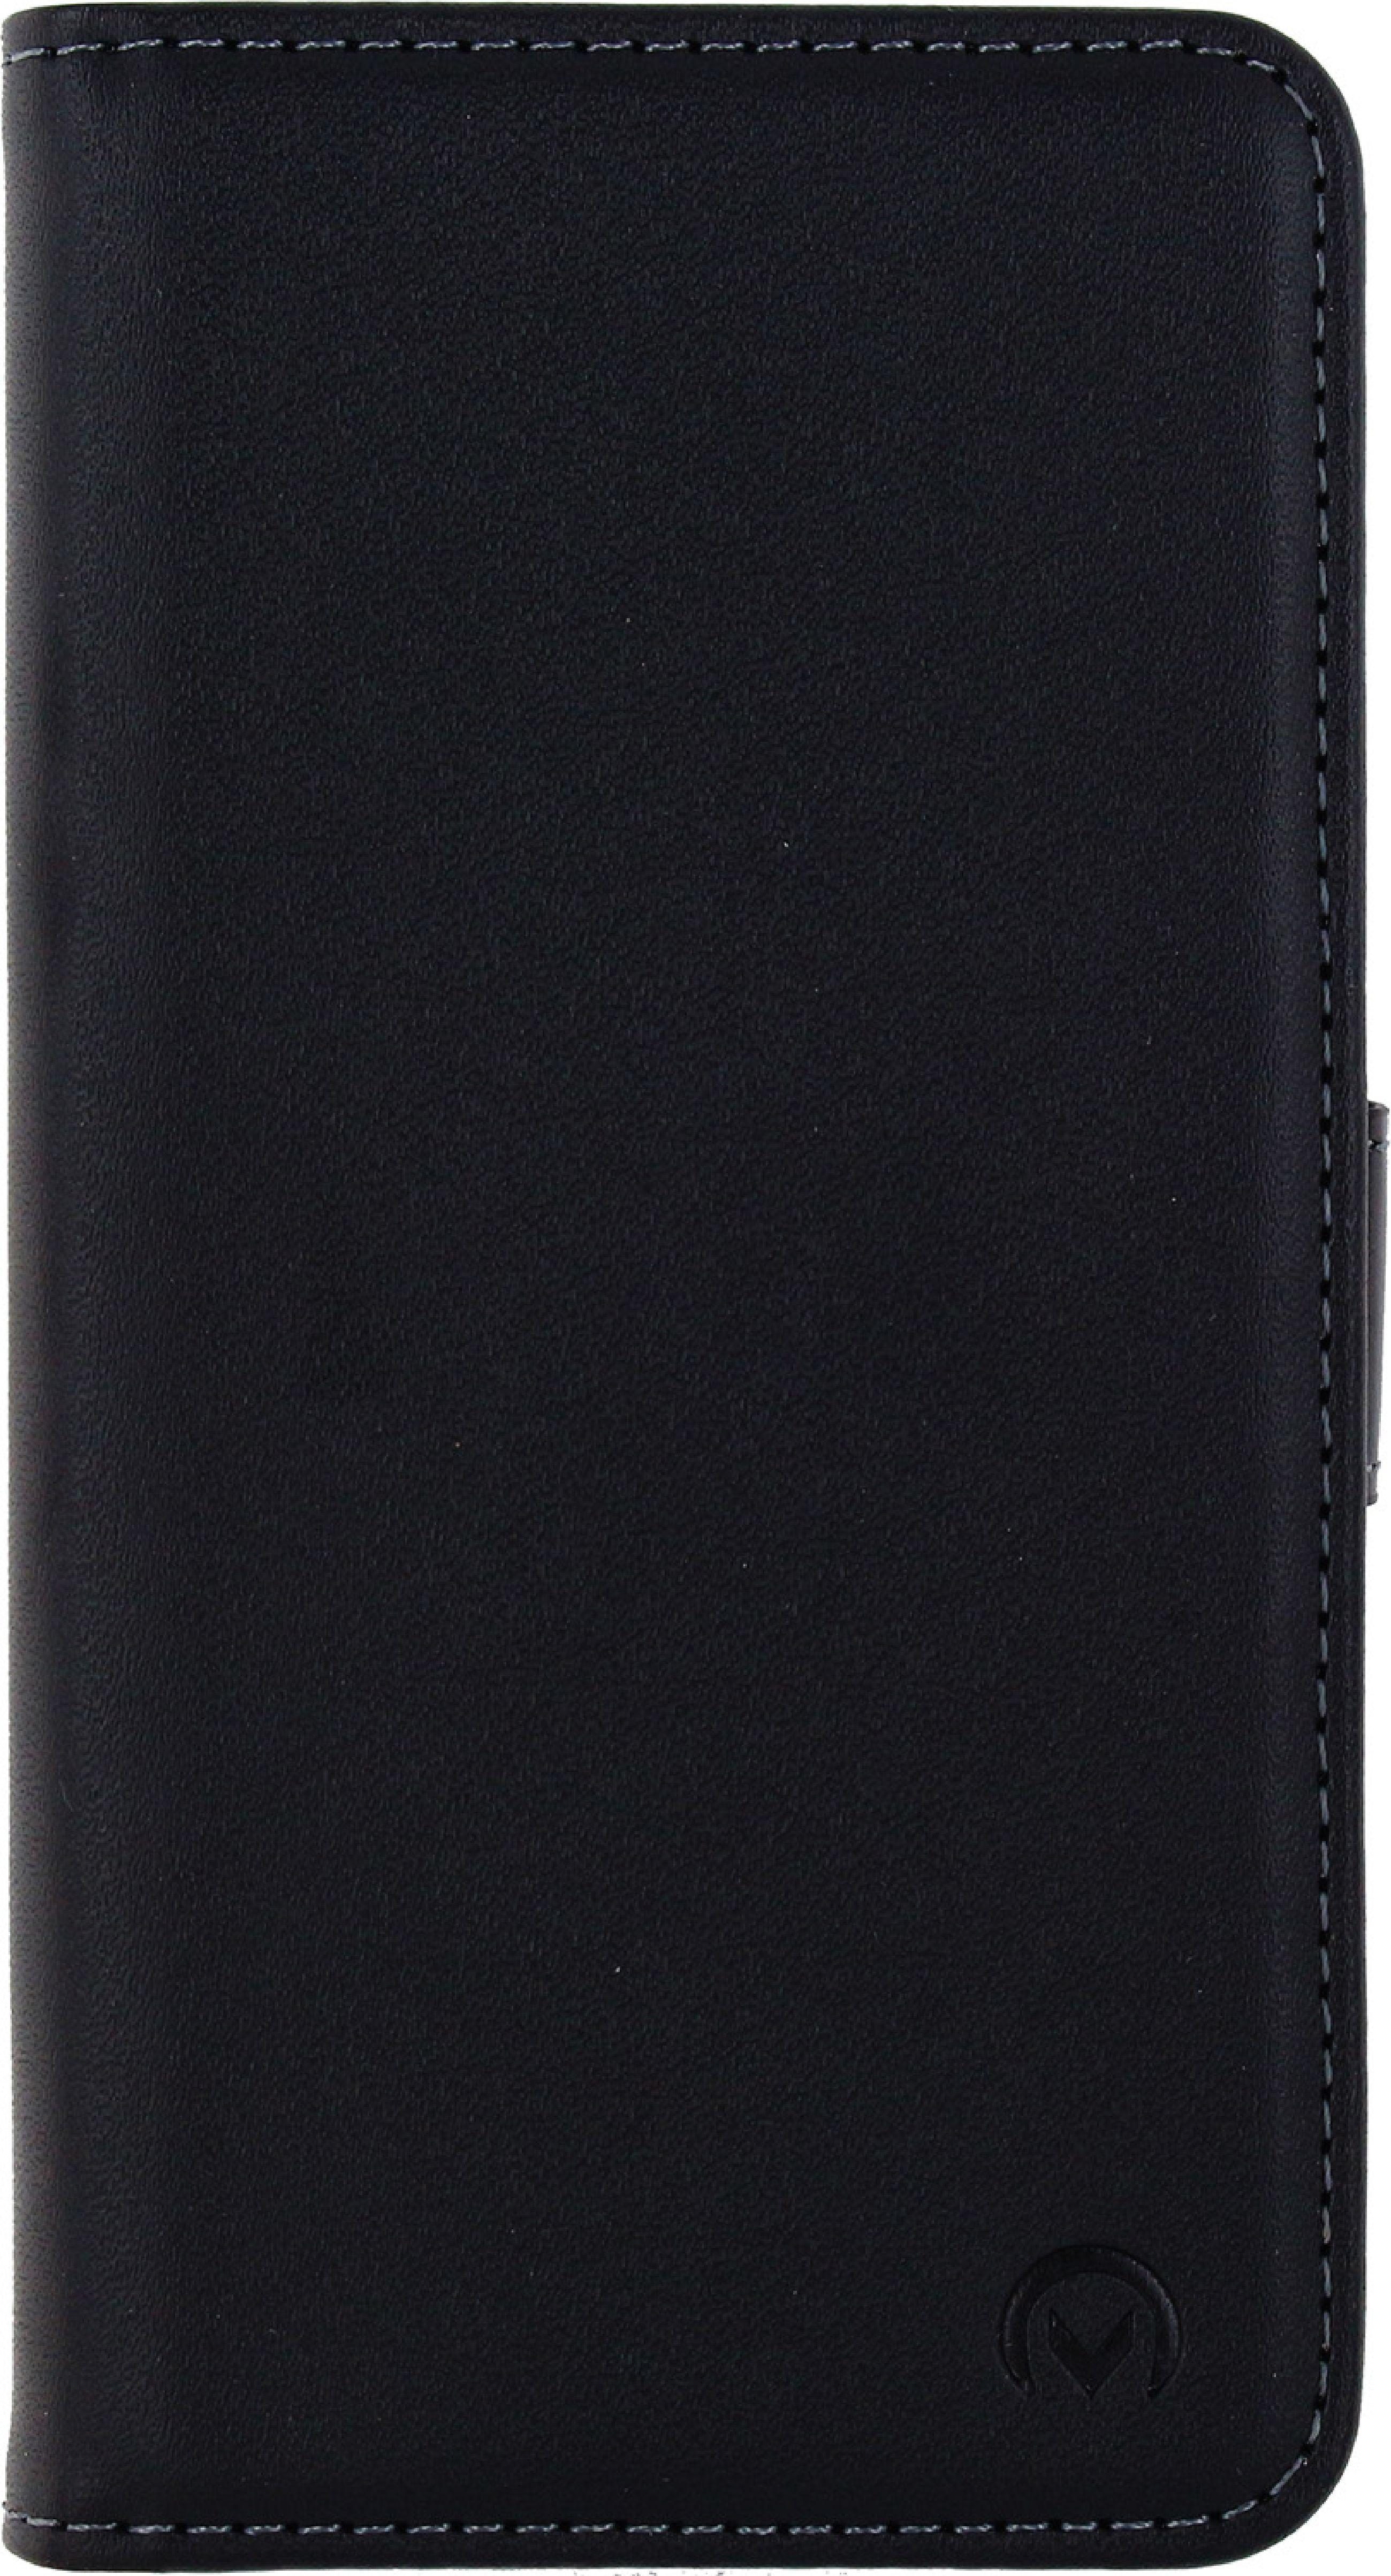 Image of   Telefon Klassisk Lommebogsetui Huawei P10 Sort